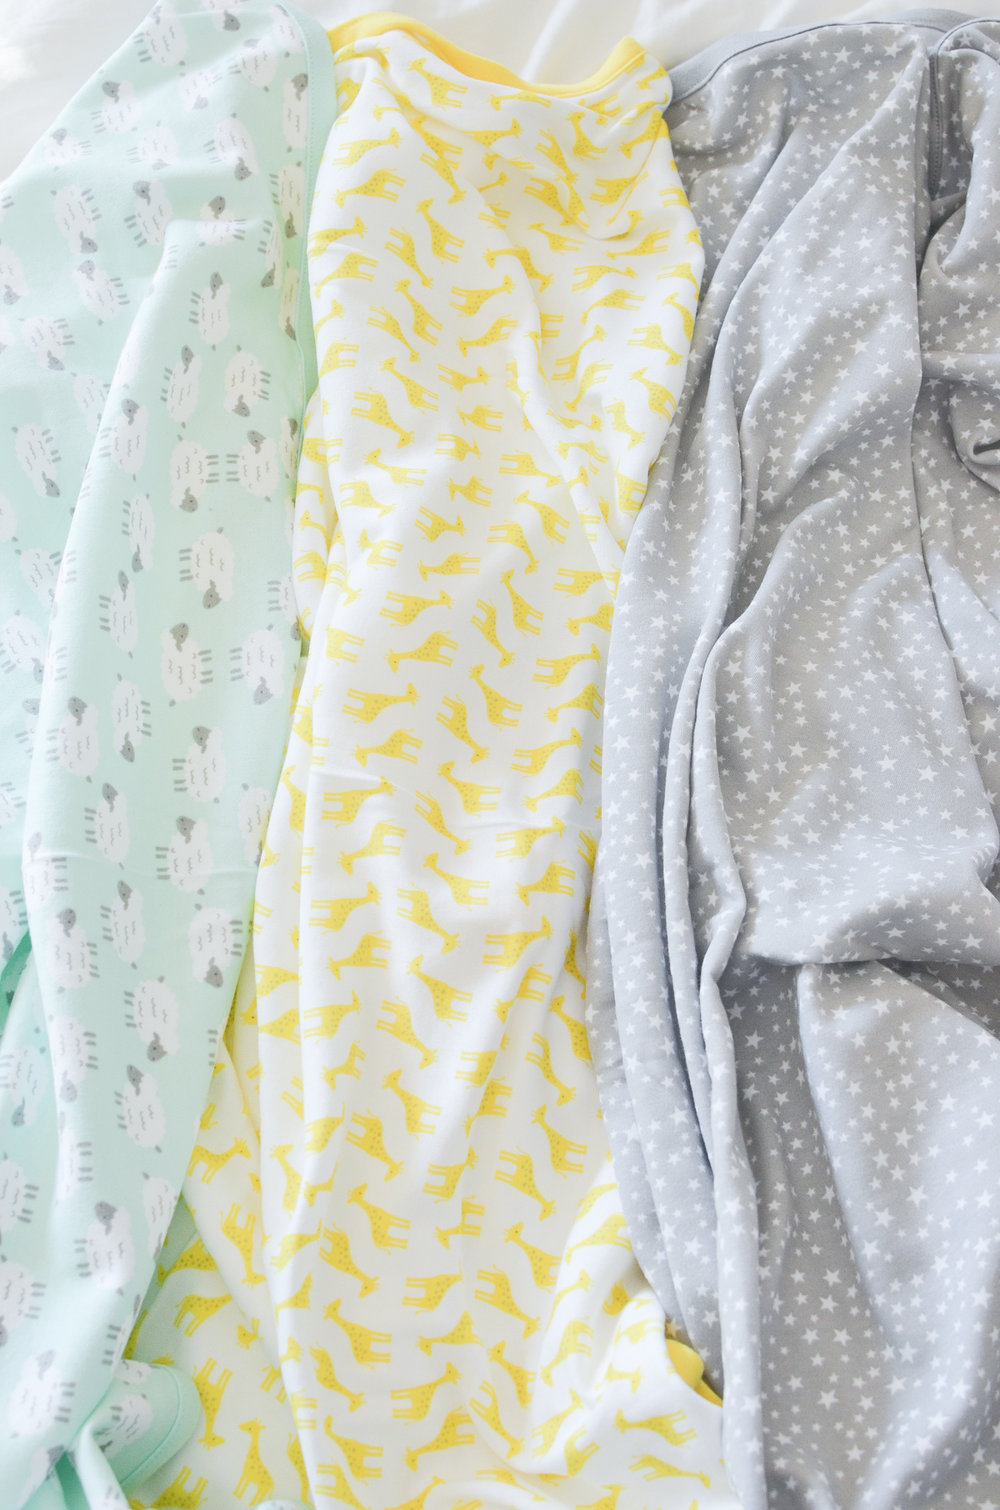 Blanket | Knit Swaddle Blanket | Simple Joy by Carter's